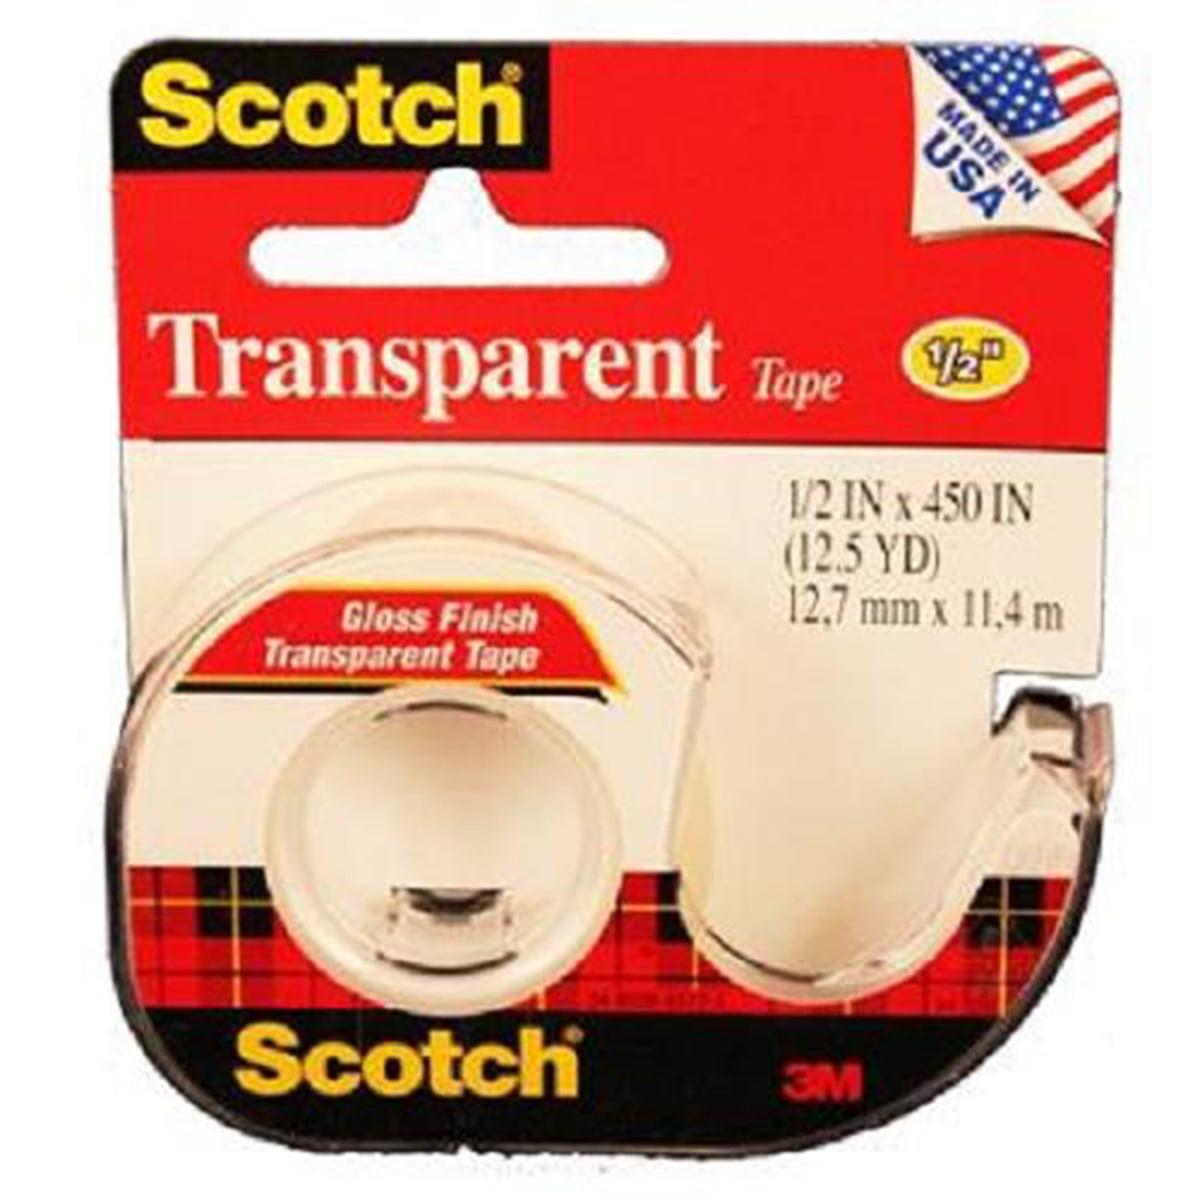 "Scotch Transparent Glossy Tape Dispenser, 1/2"" x 450"""